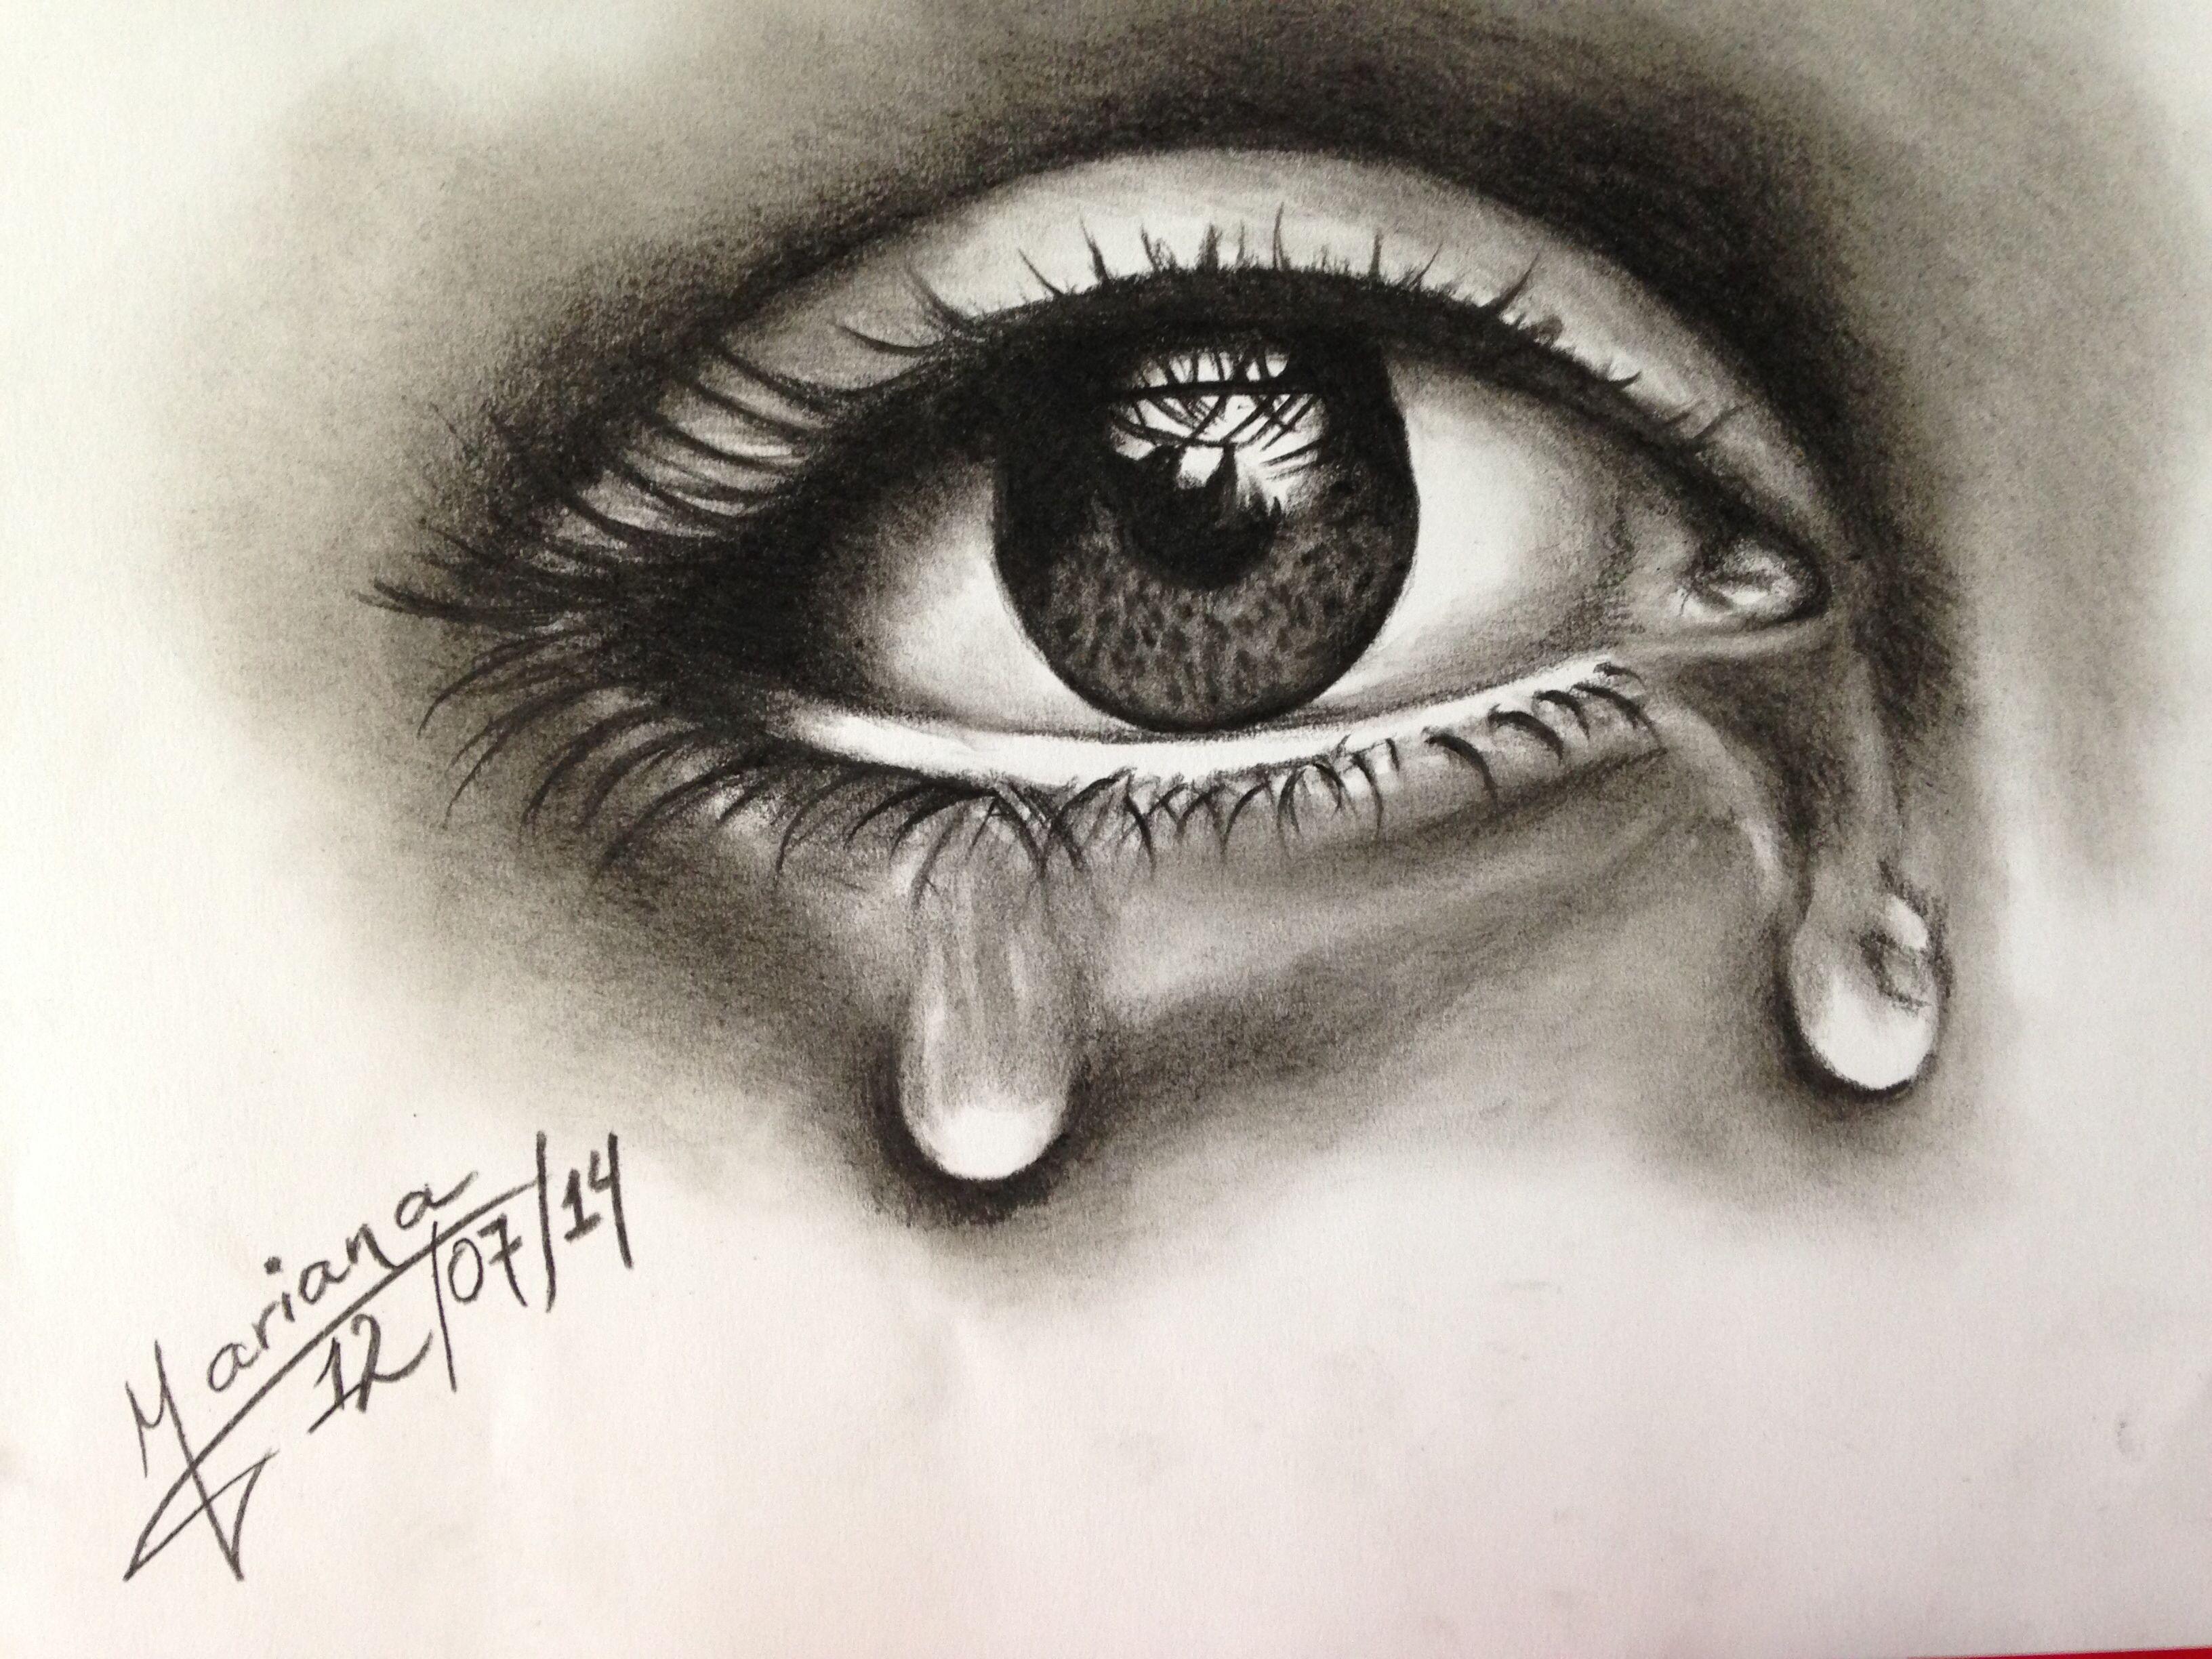 Tratando de aprender a dibujar un ojo realista  Laminas lapiz